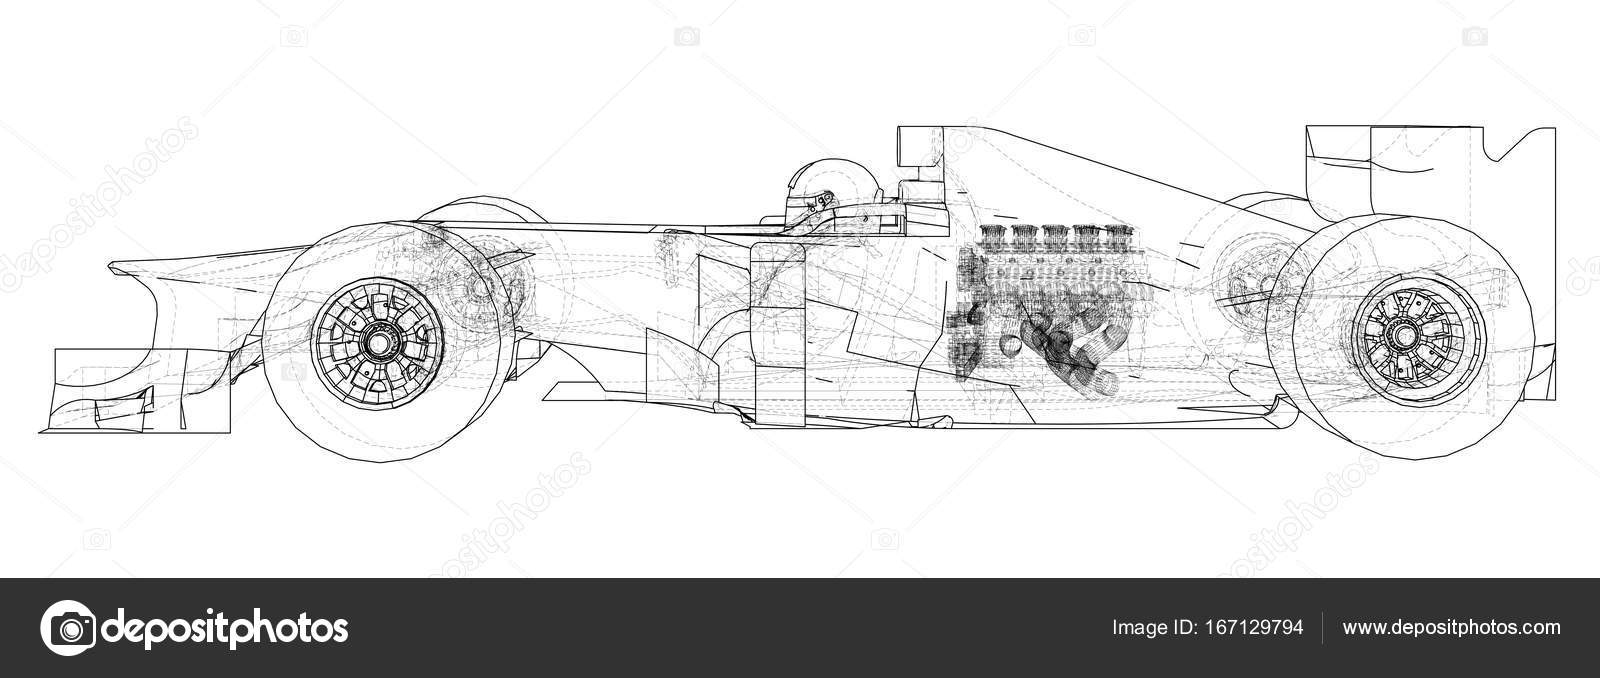 95 C280 Radio Wiring Diagram additionally Mercedes Sl500 Fuse Box Chart likewise Mercedes Slk Parts Diagram Auto Wiring in addition Parts For 1978 Mercedes 450sl together with 1993 300sl Engine Diagram. on mercedes sl500 fuse box diagram